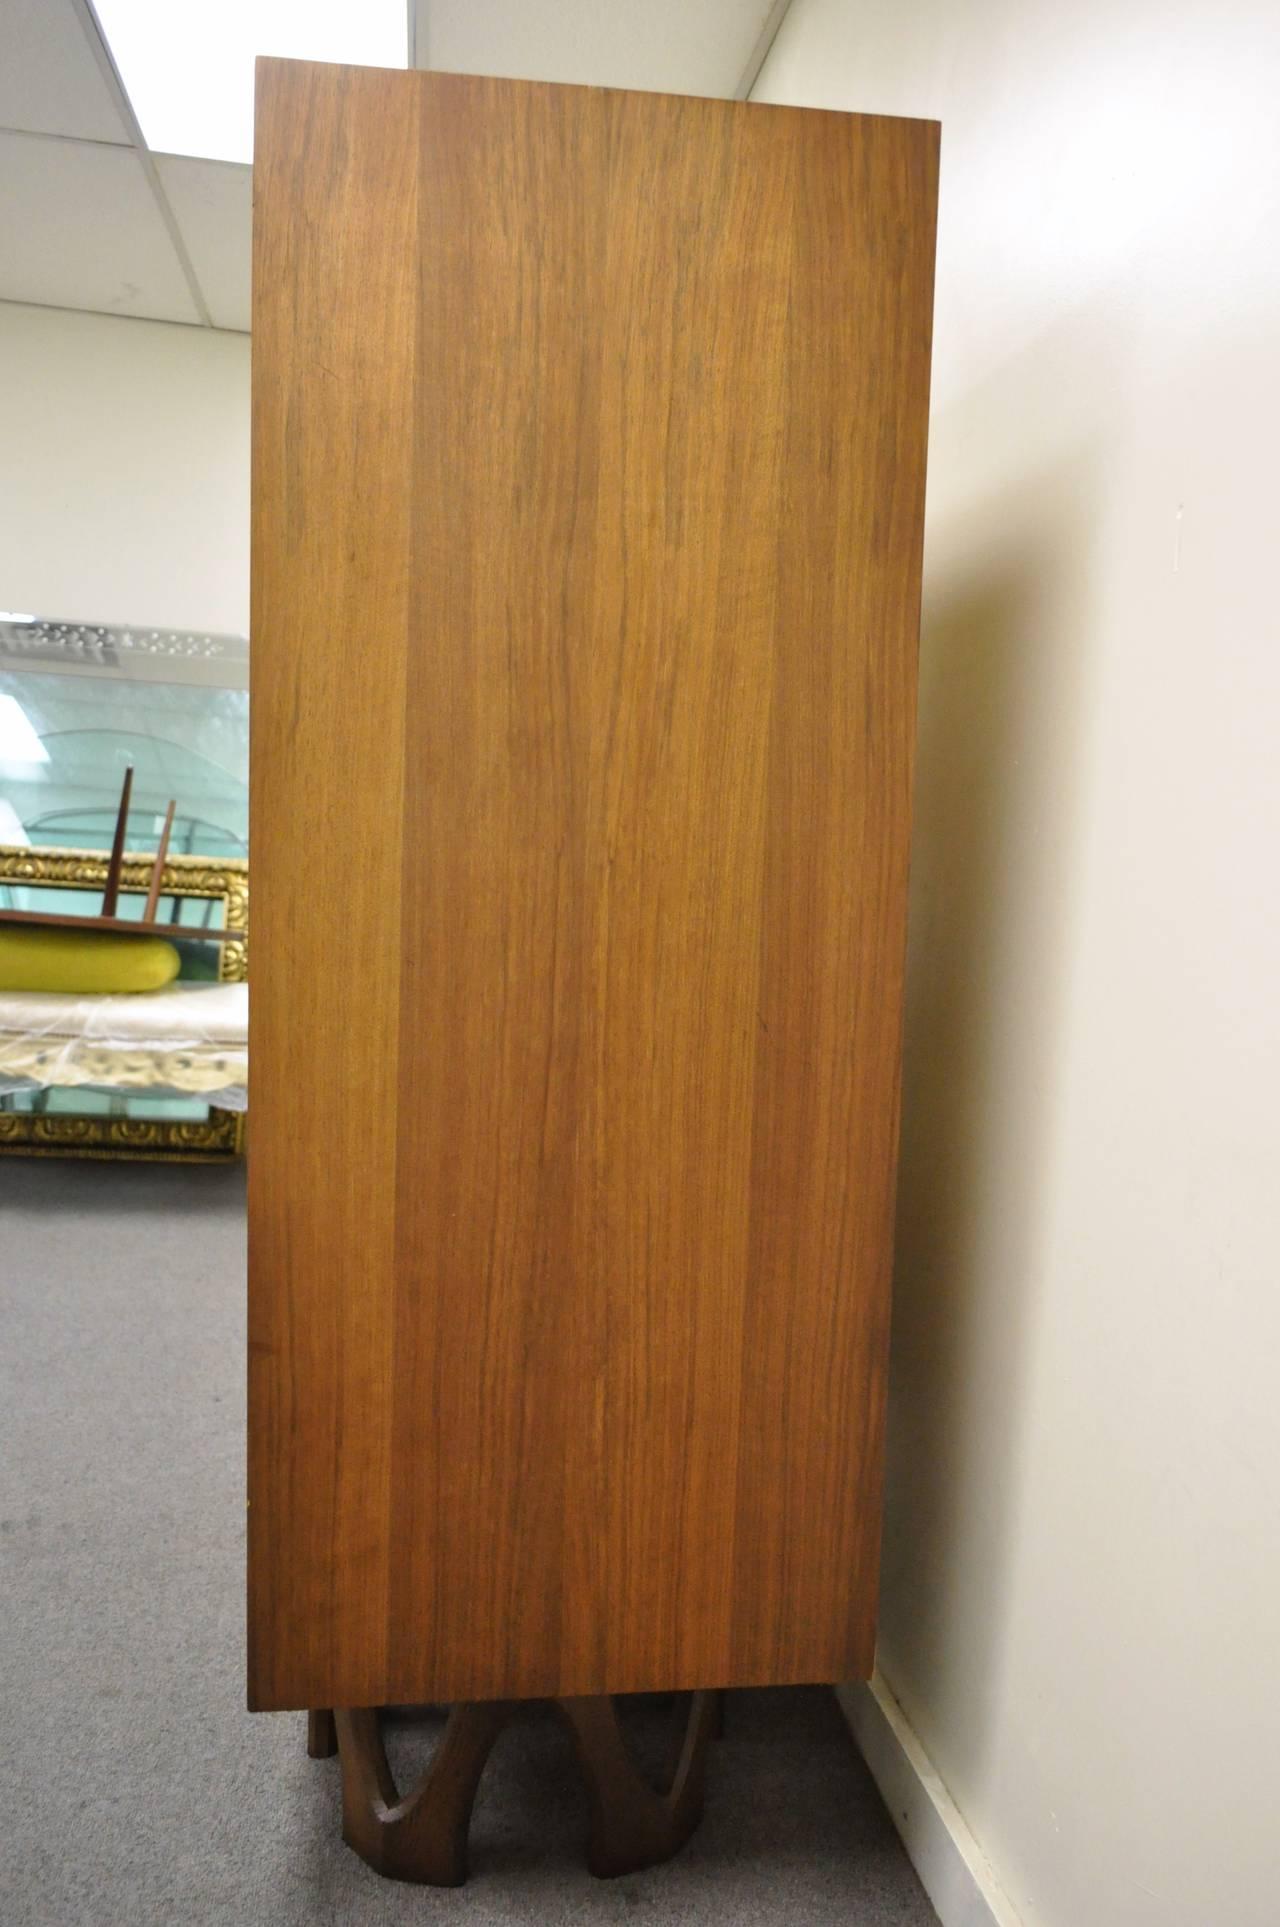 Mid Century Modern Brutalist Walnut Armoire Dresser Tall Chest after Paul Evans For Sale 1